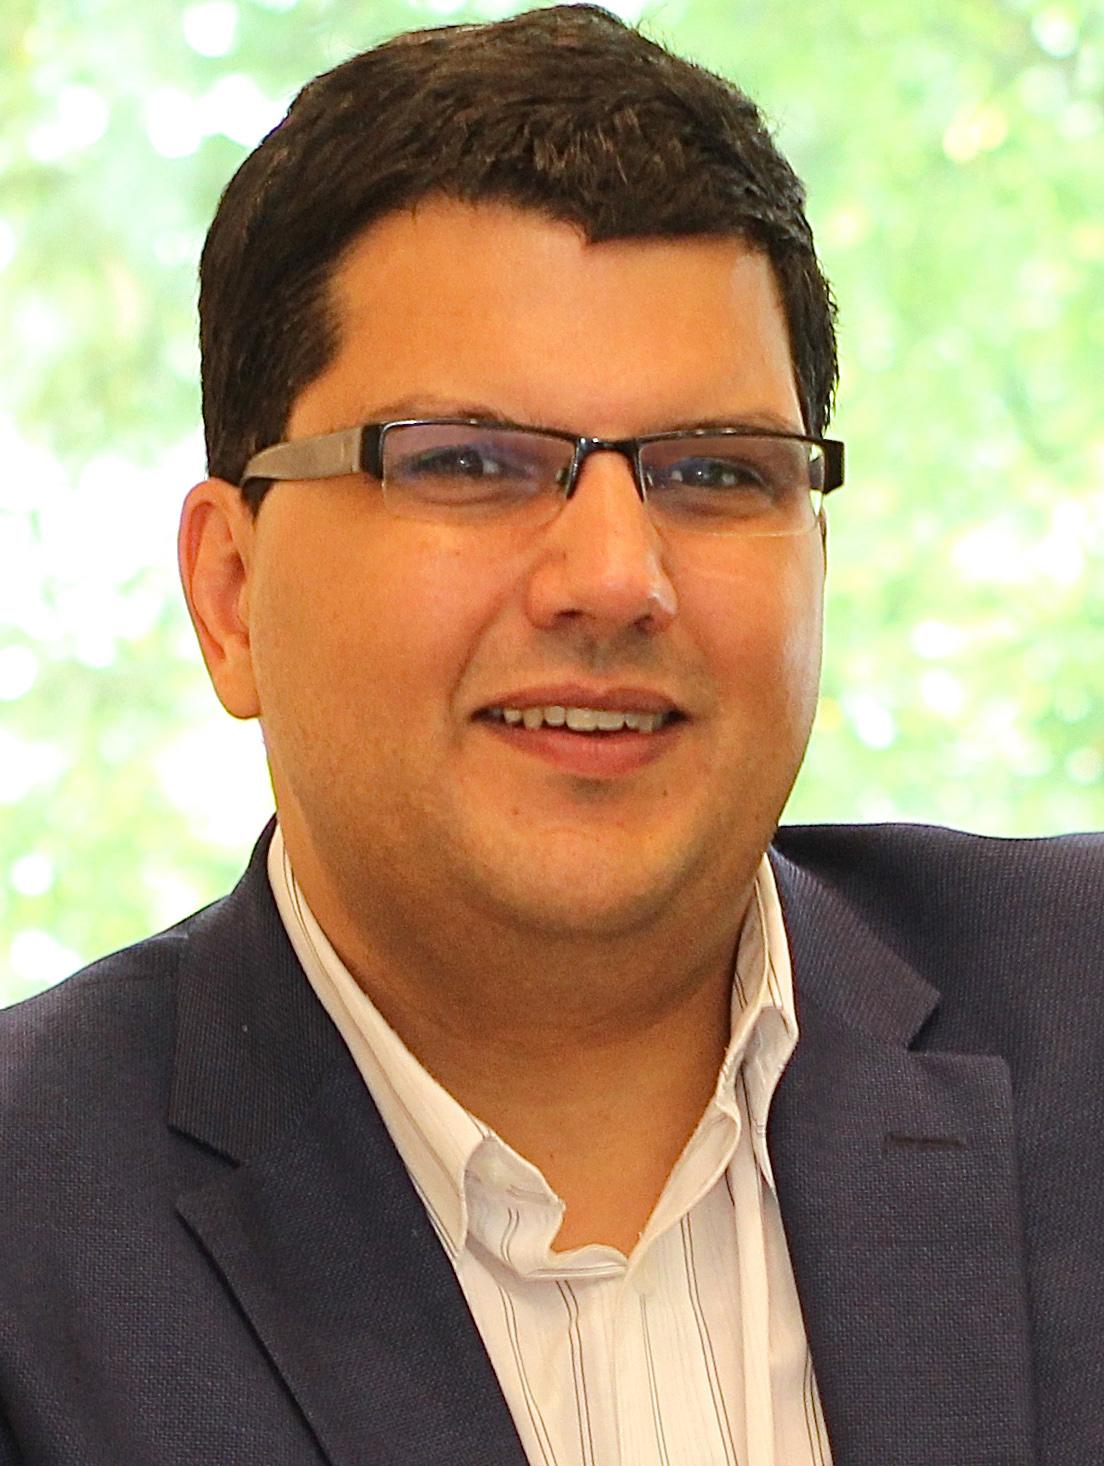 Daniel Ansari